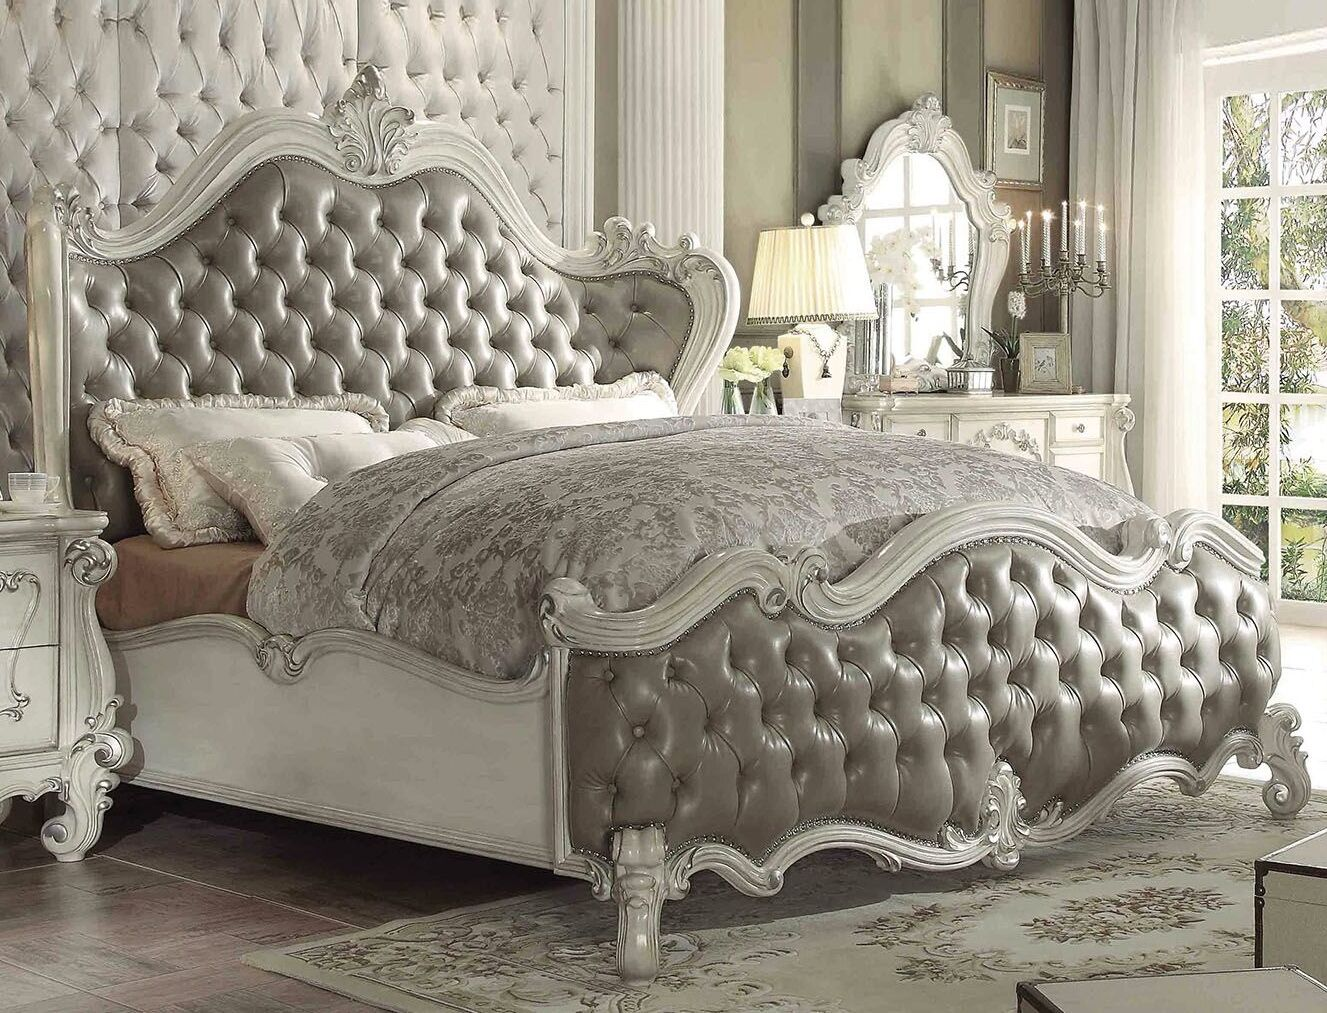 Tanner Upholstered Panel Bed Size: King, Color: Bone White